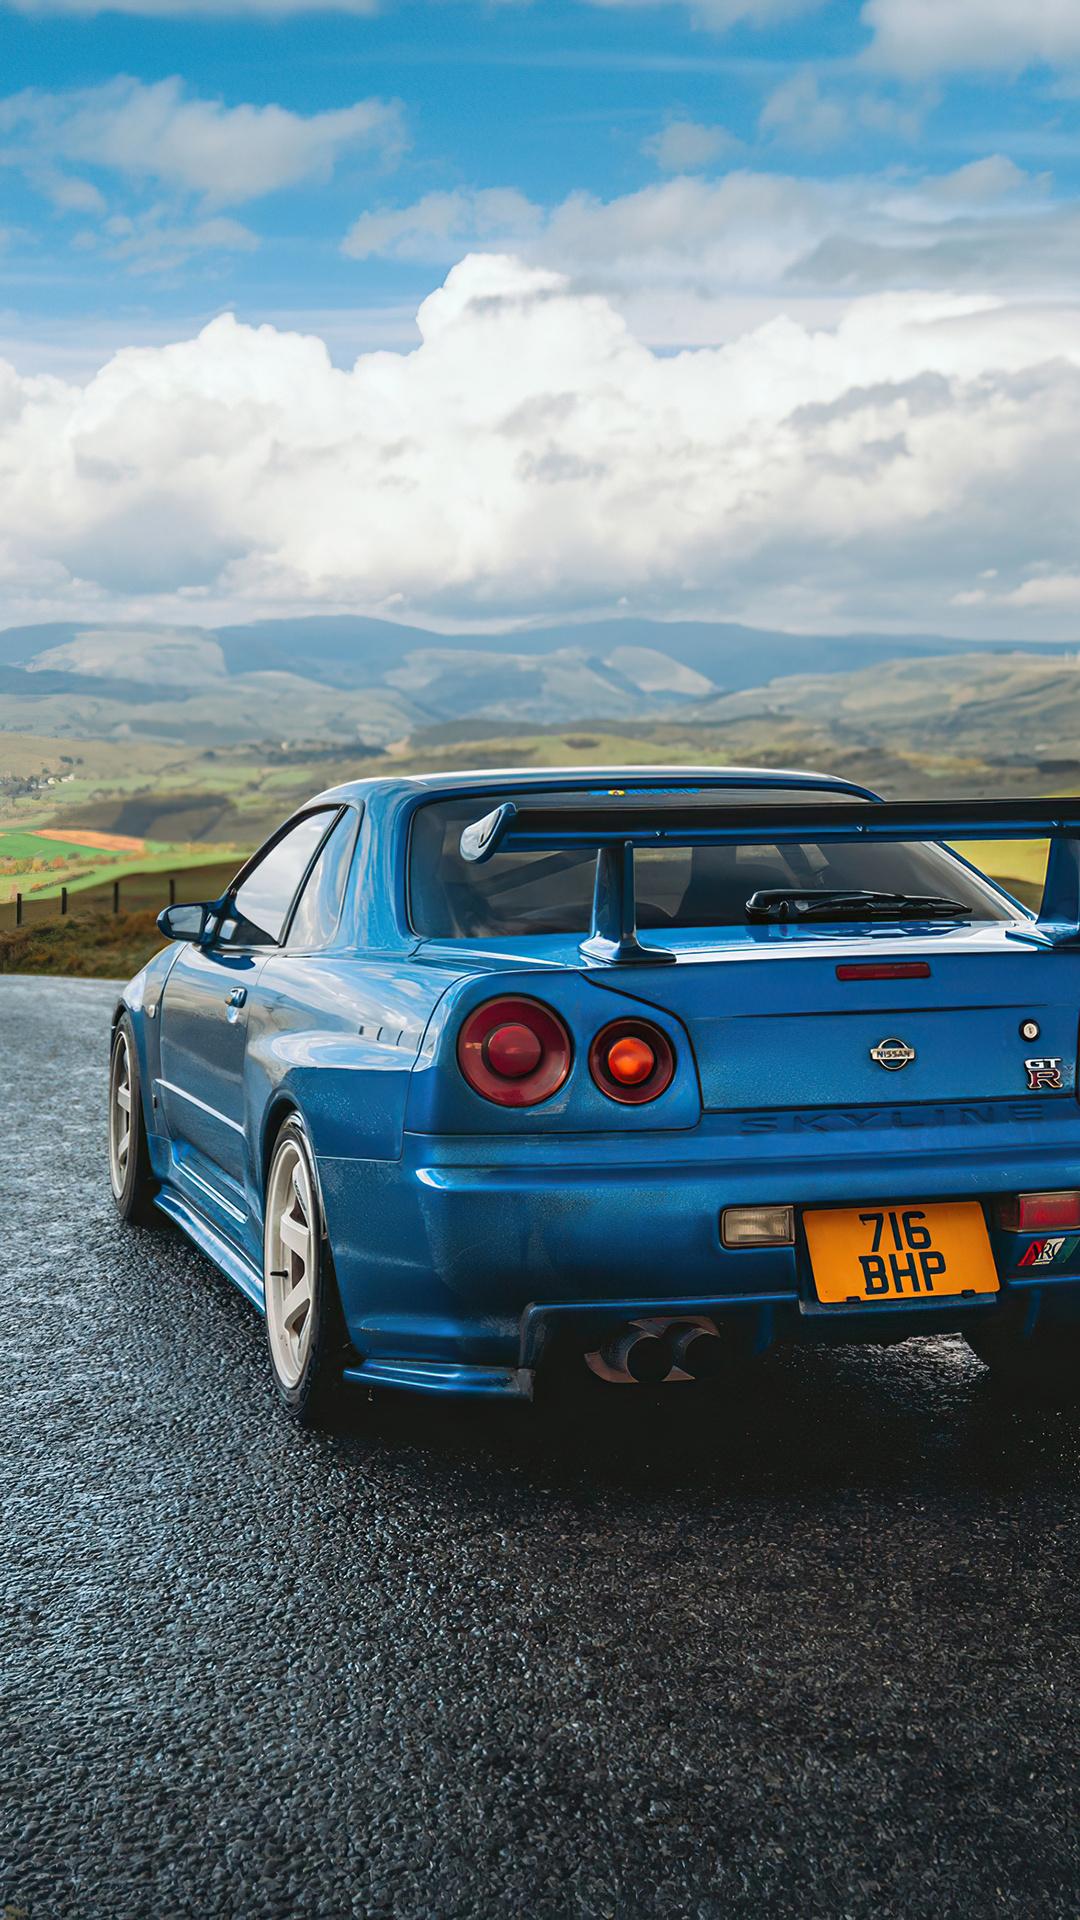 1080x1920 Nissan Skyline Gtr R34 Iphone 7,6s,6 Plus, Pixel ...